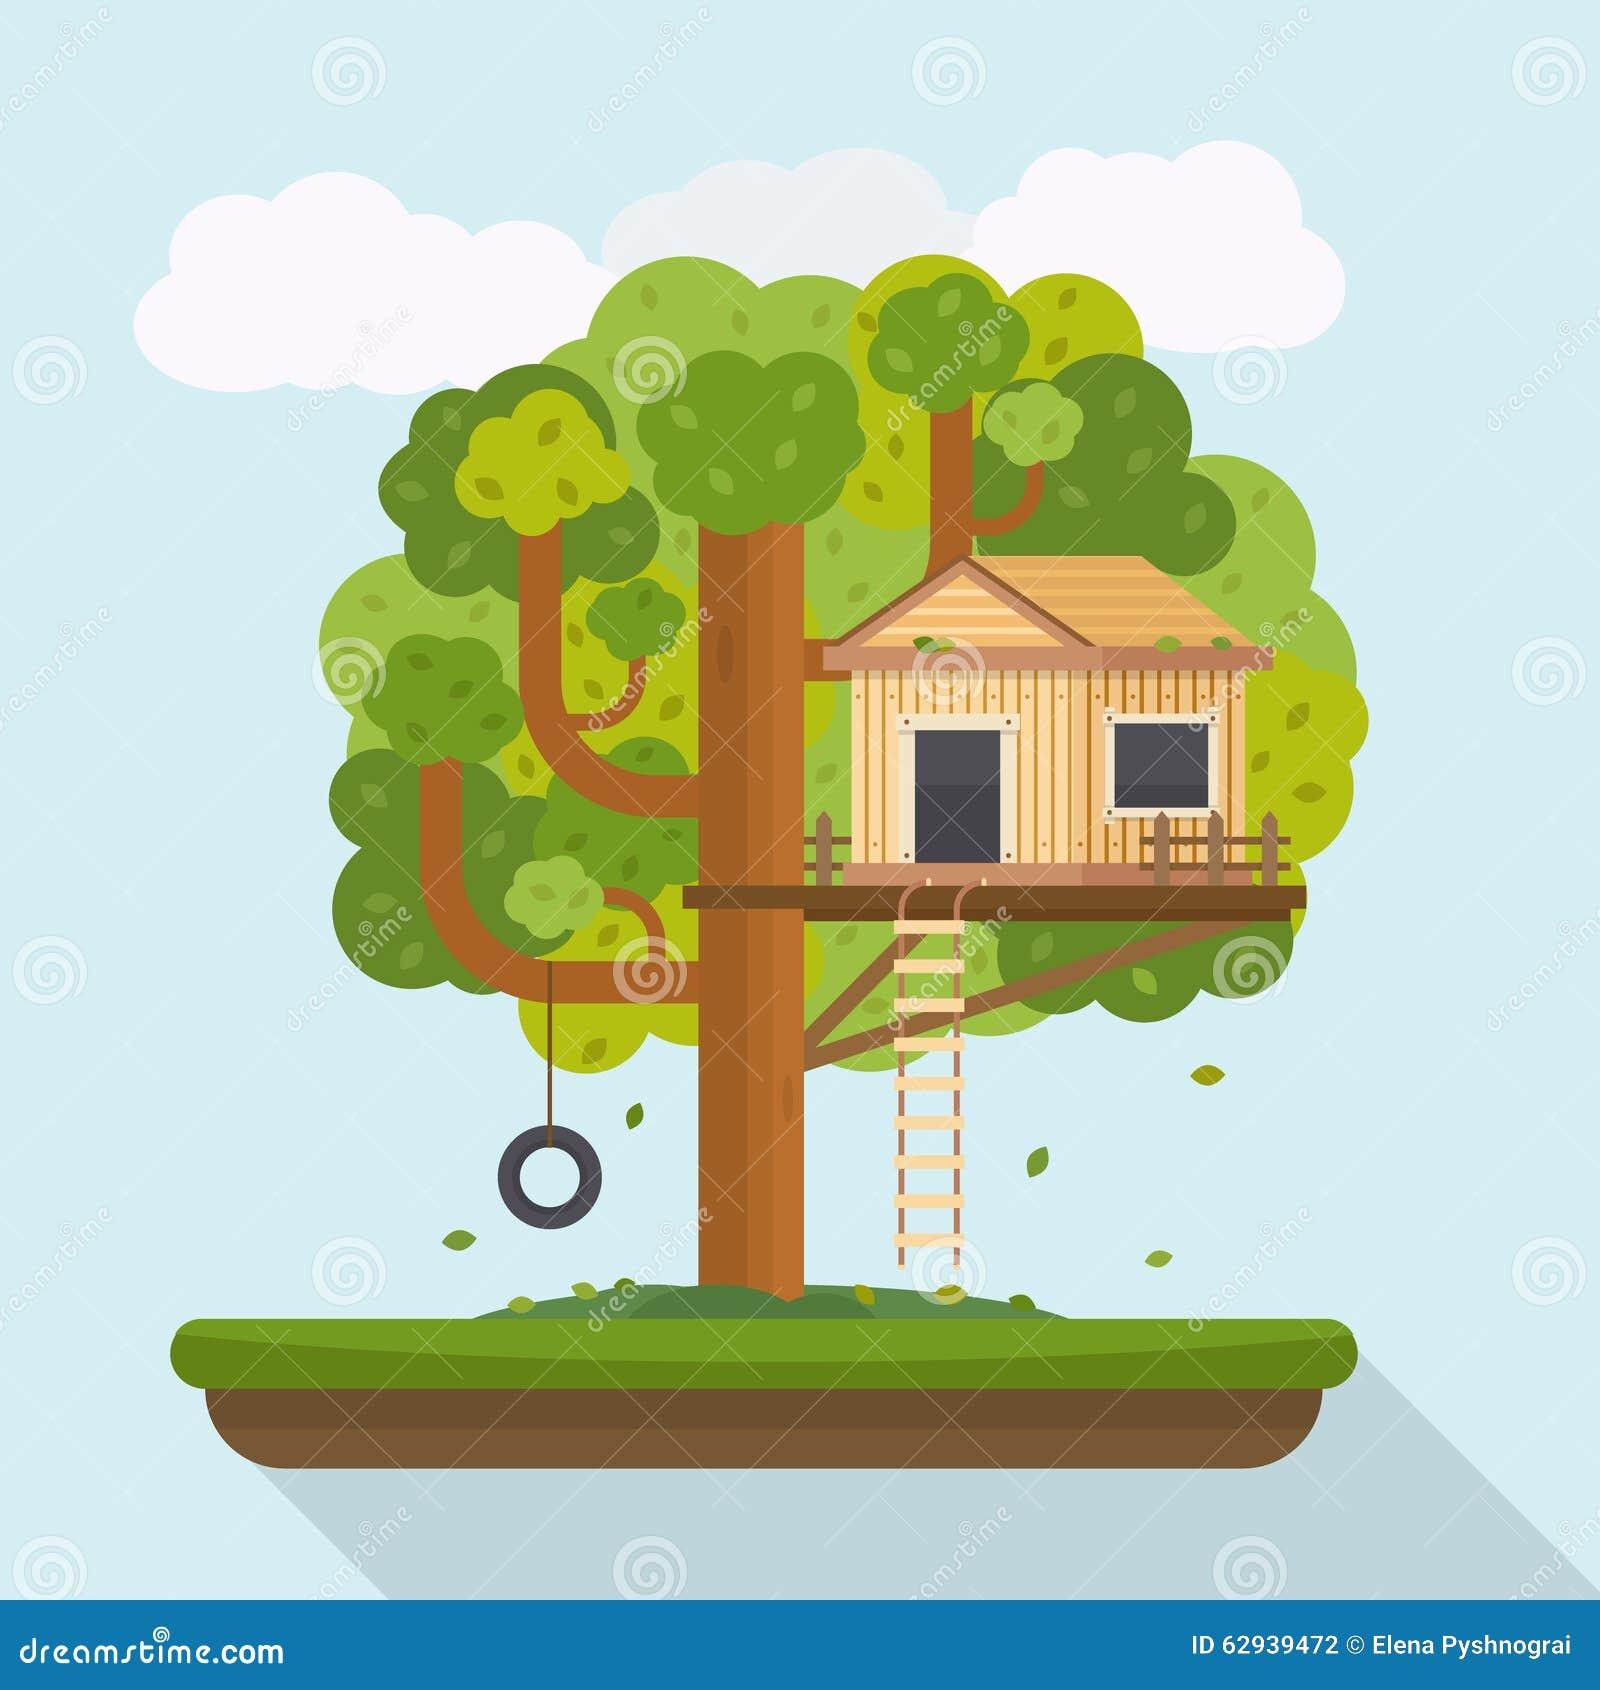 Tree house house on tree for kids stock vector image - Creation de maison virtuelle gratuit ...